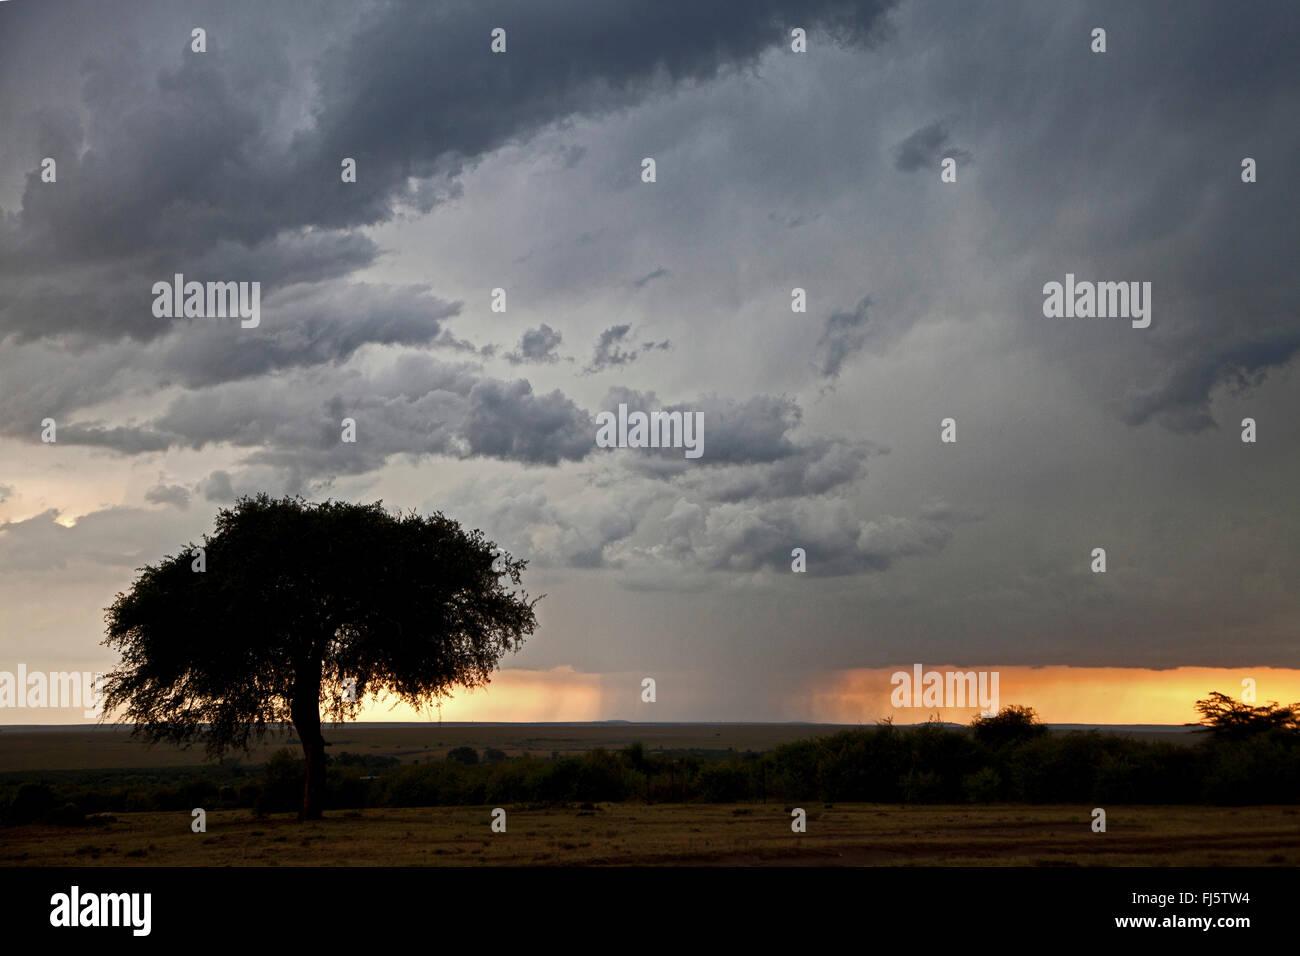 intense rainfall at Massai Mara, Kenya, Masai Mara National Park - Stock Image